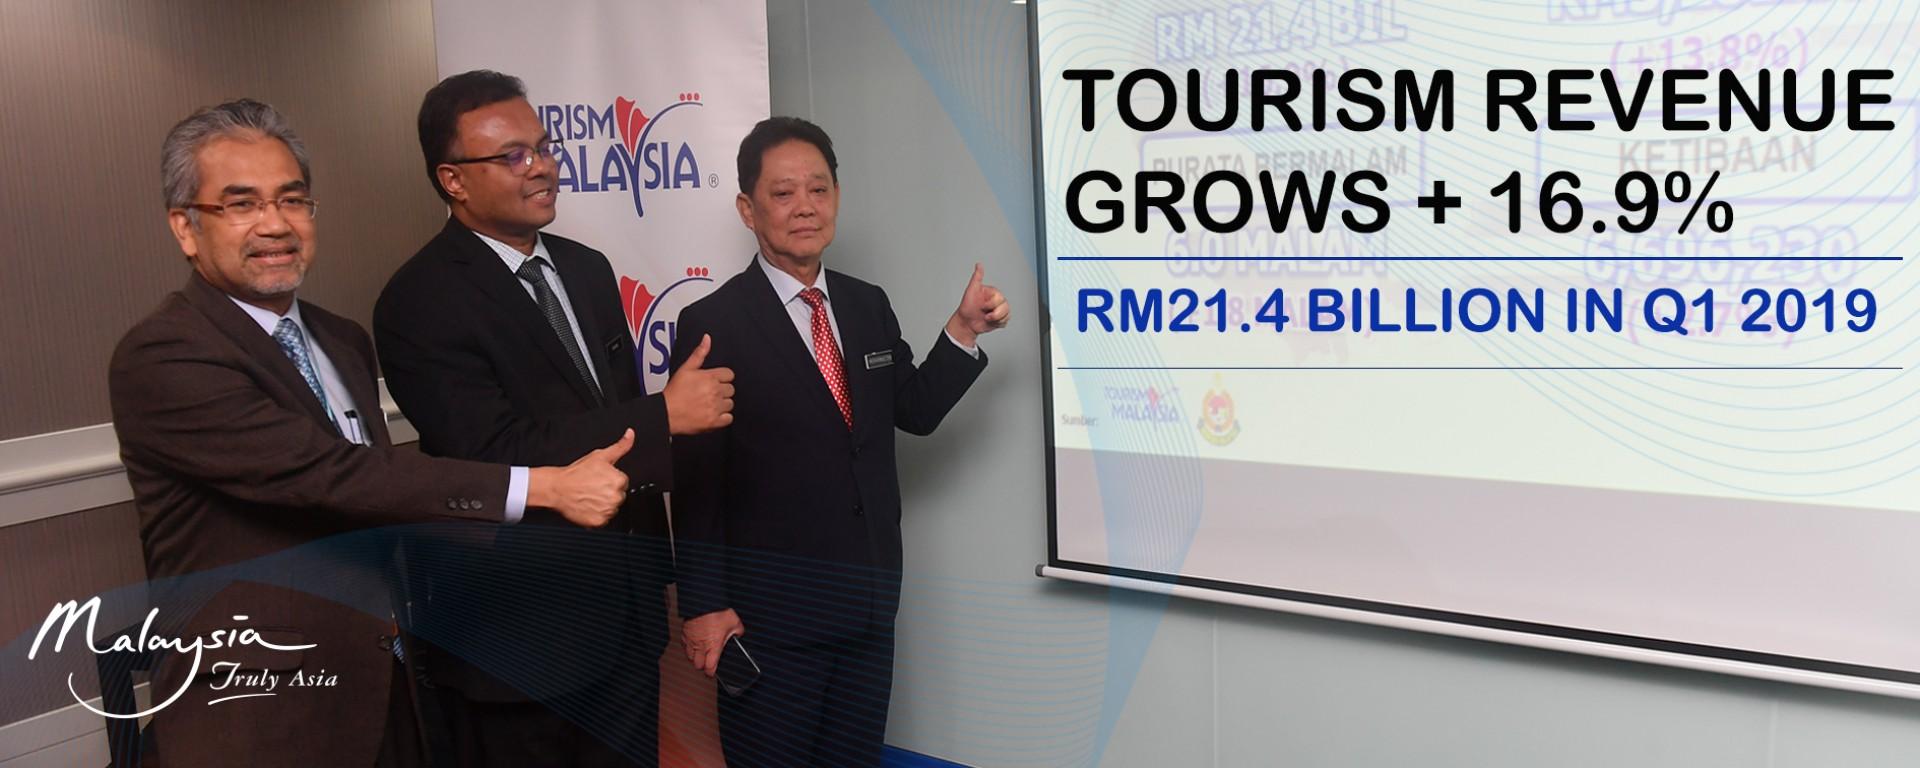 <div class='slider-left'><span class='caption'></span><div class='action '><a href='https://www.tourism.gov.my/media/view/tourism-revenue-grows-16-9-reaches-rm21-4-billion-in-q1-2019' class='btn btn-danger btn-lg' target=''>Read more</a></div></div>